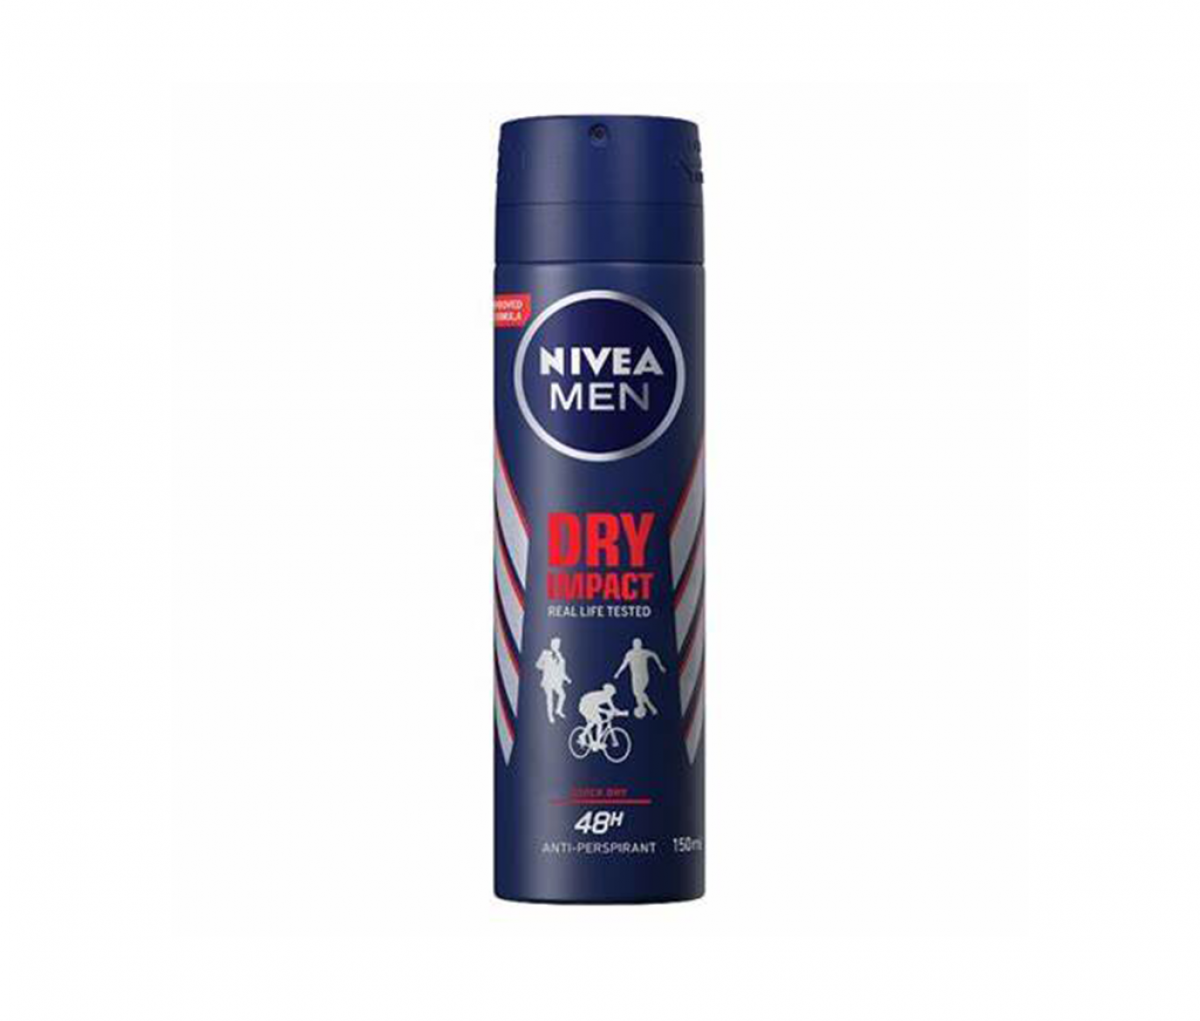 Nivea Men Body Spray Silver Dry Impack Plus